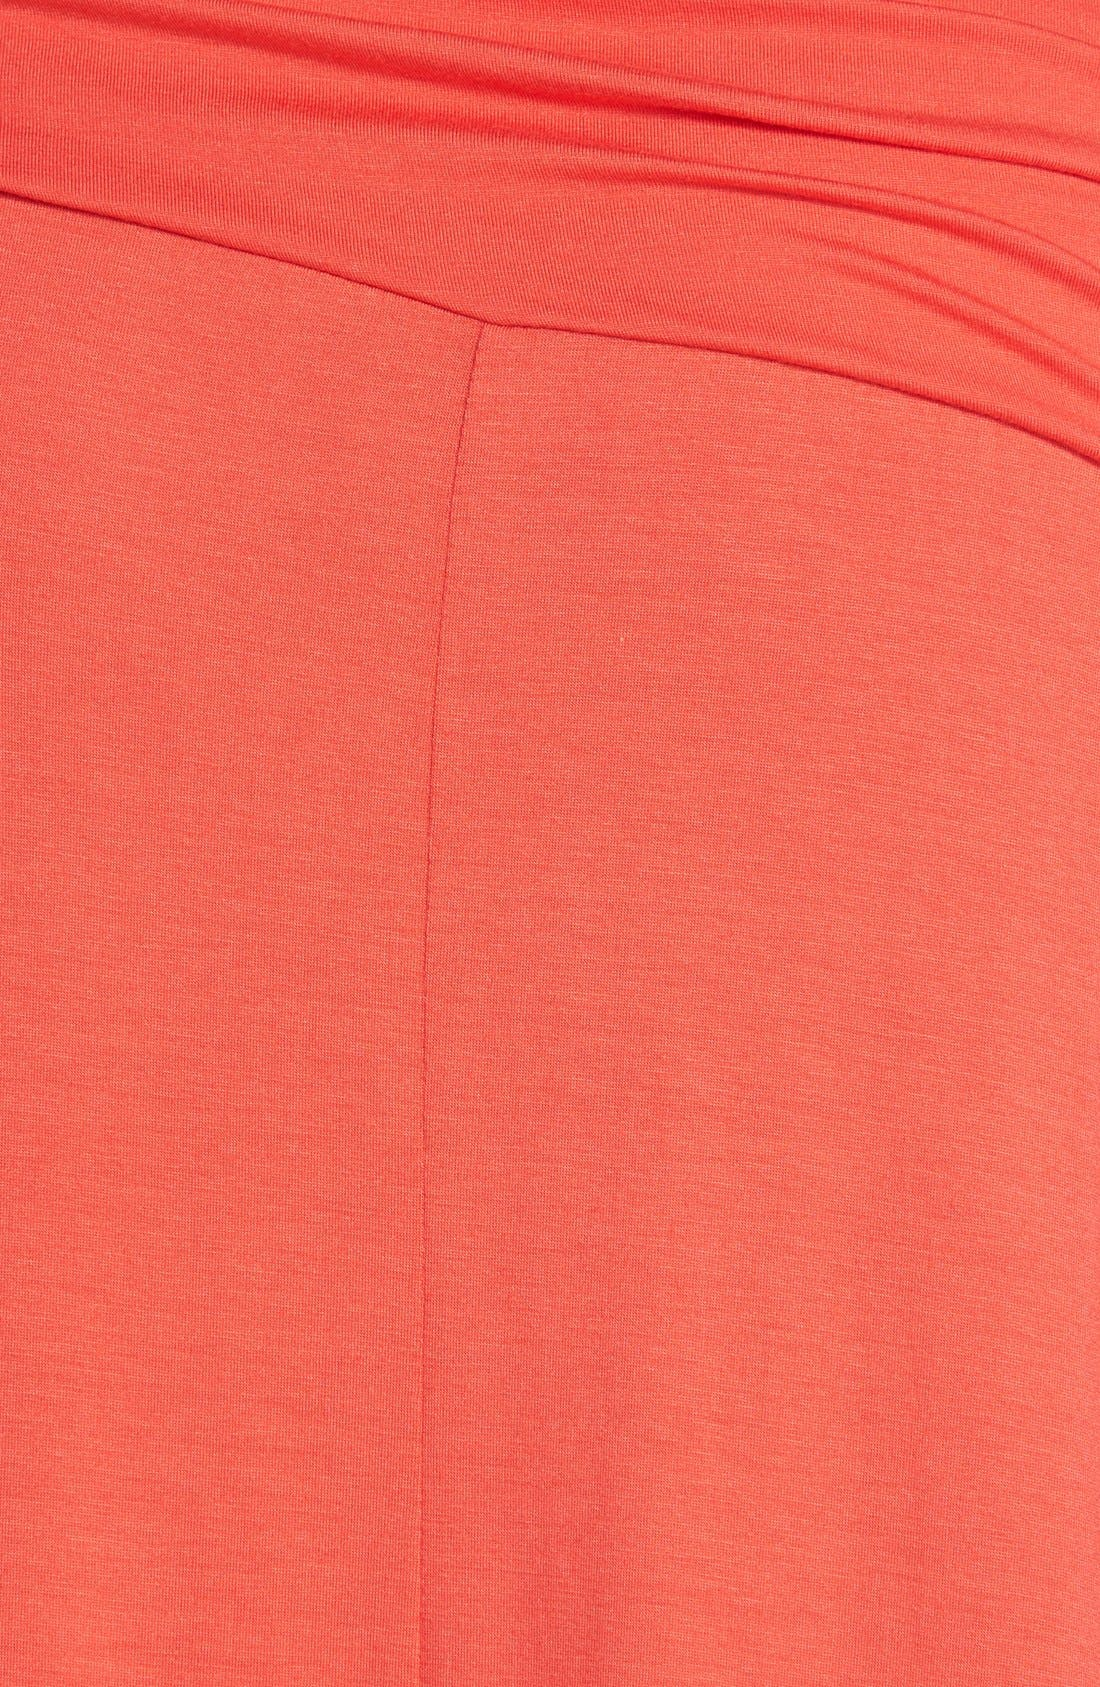 Asymmetric Knit Maxi Skirt,                             Alternate thumbnail 25, color,